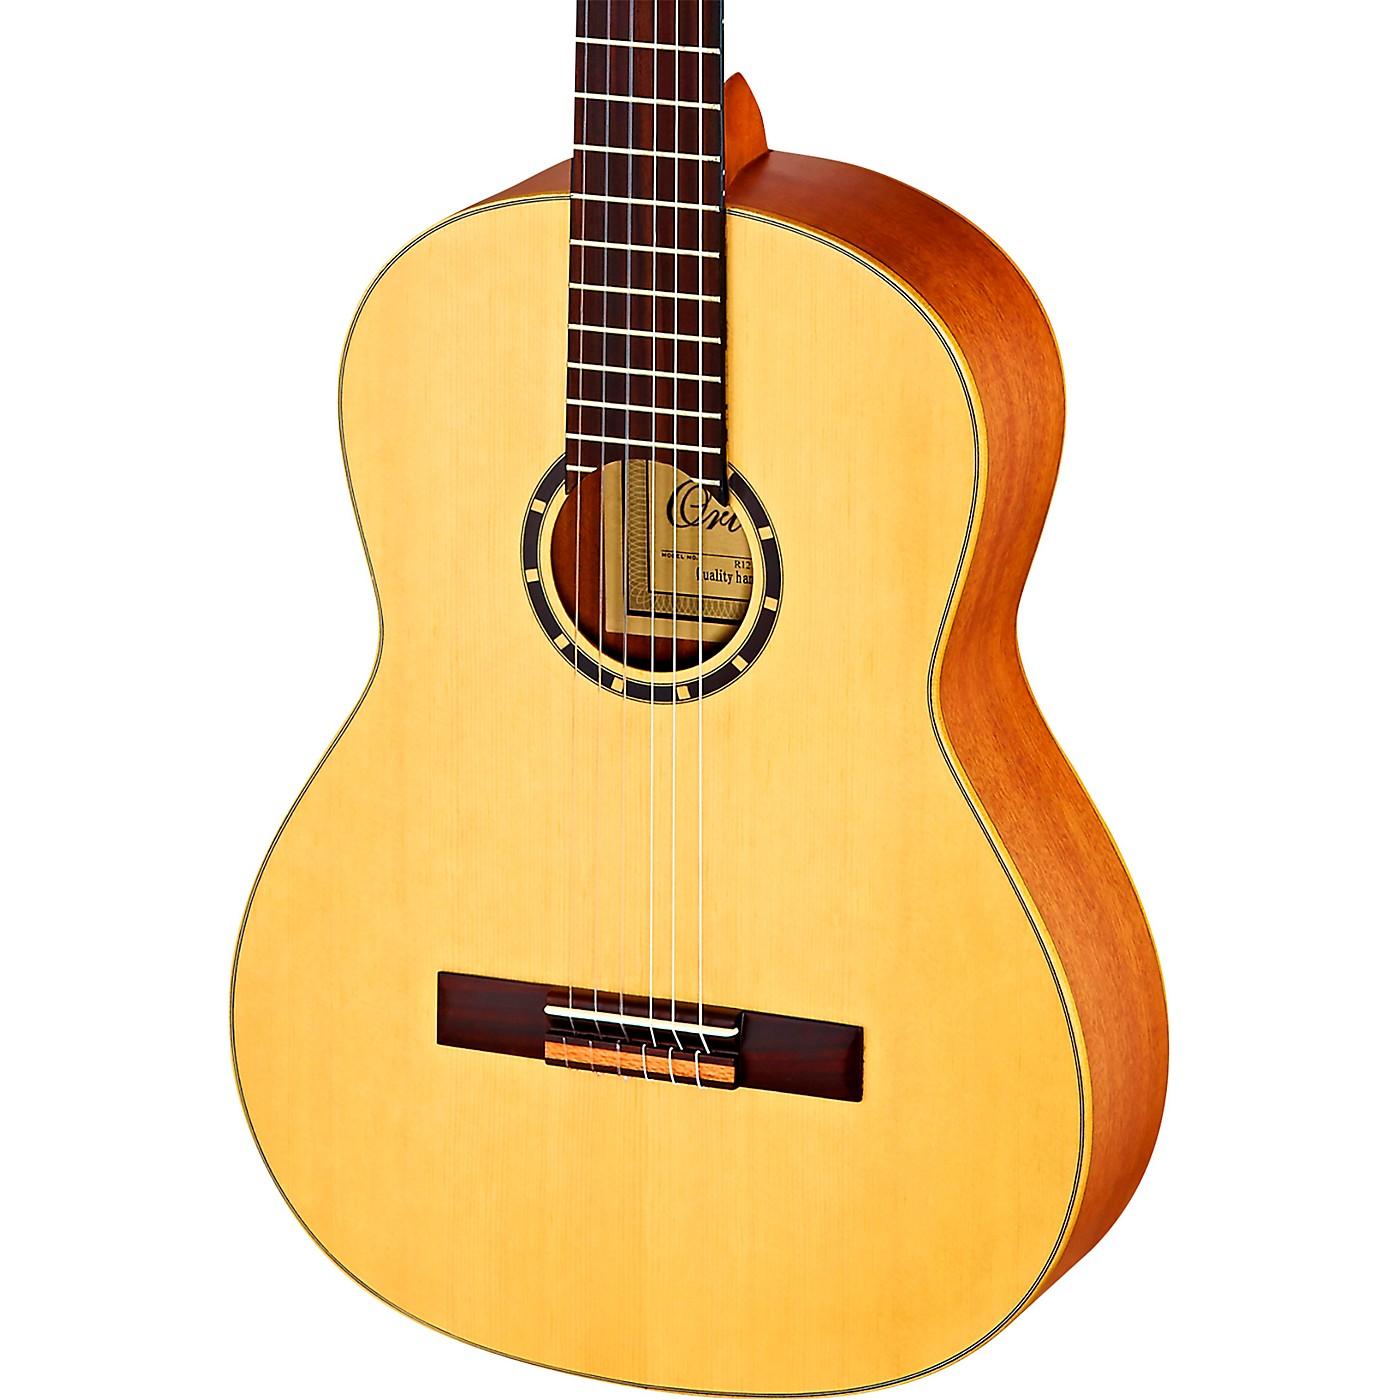 Ortega Family Series R121L Left-Handed Classical Guitar thumbnail